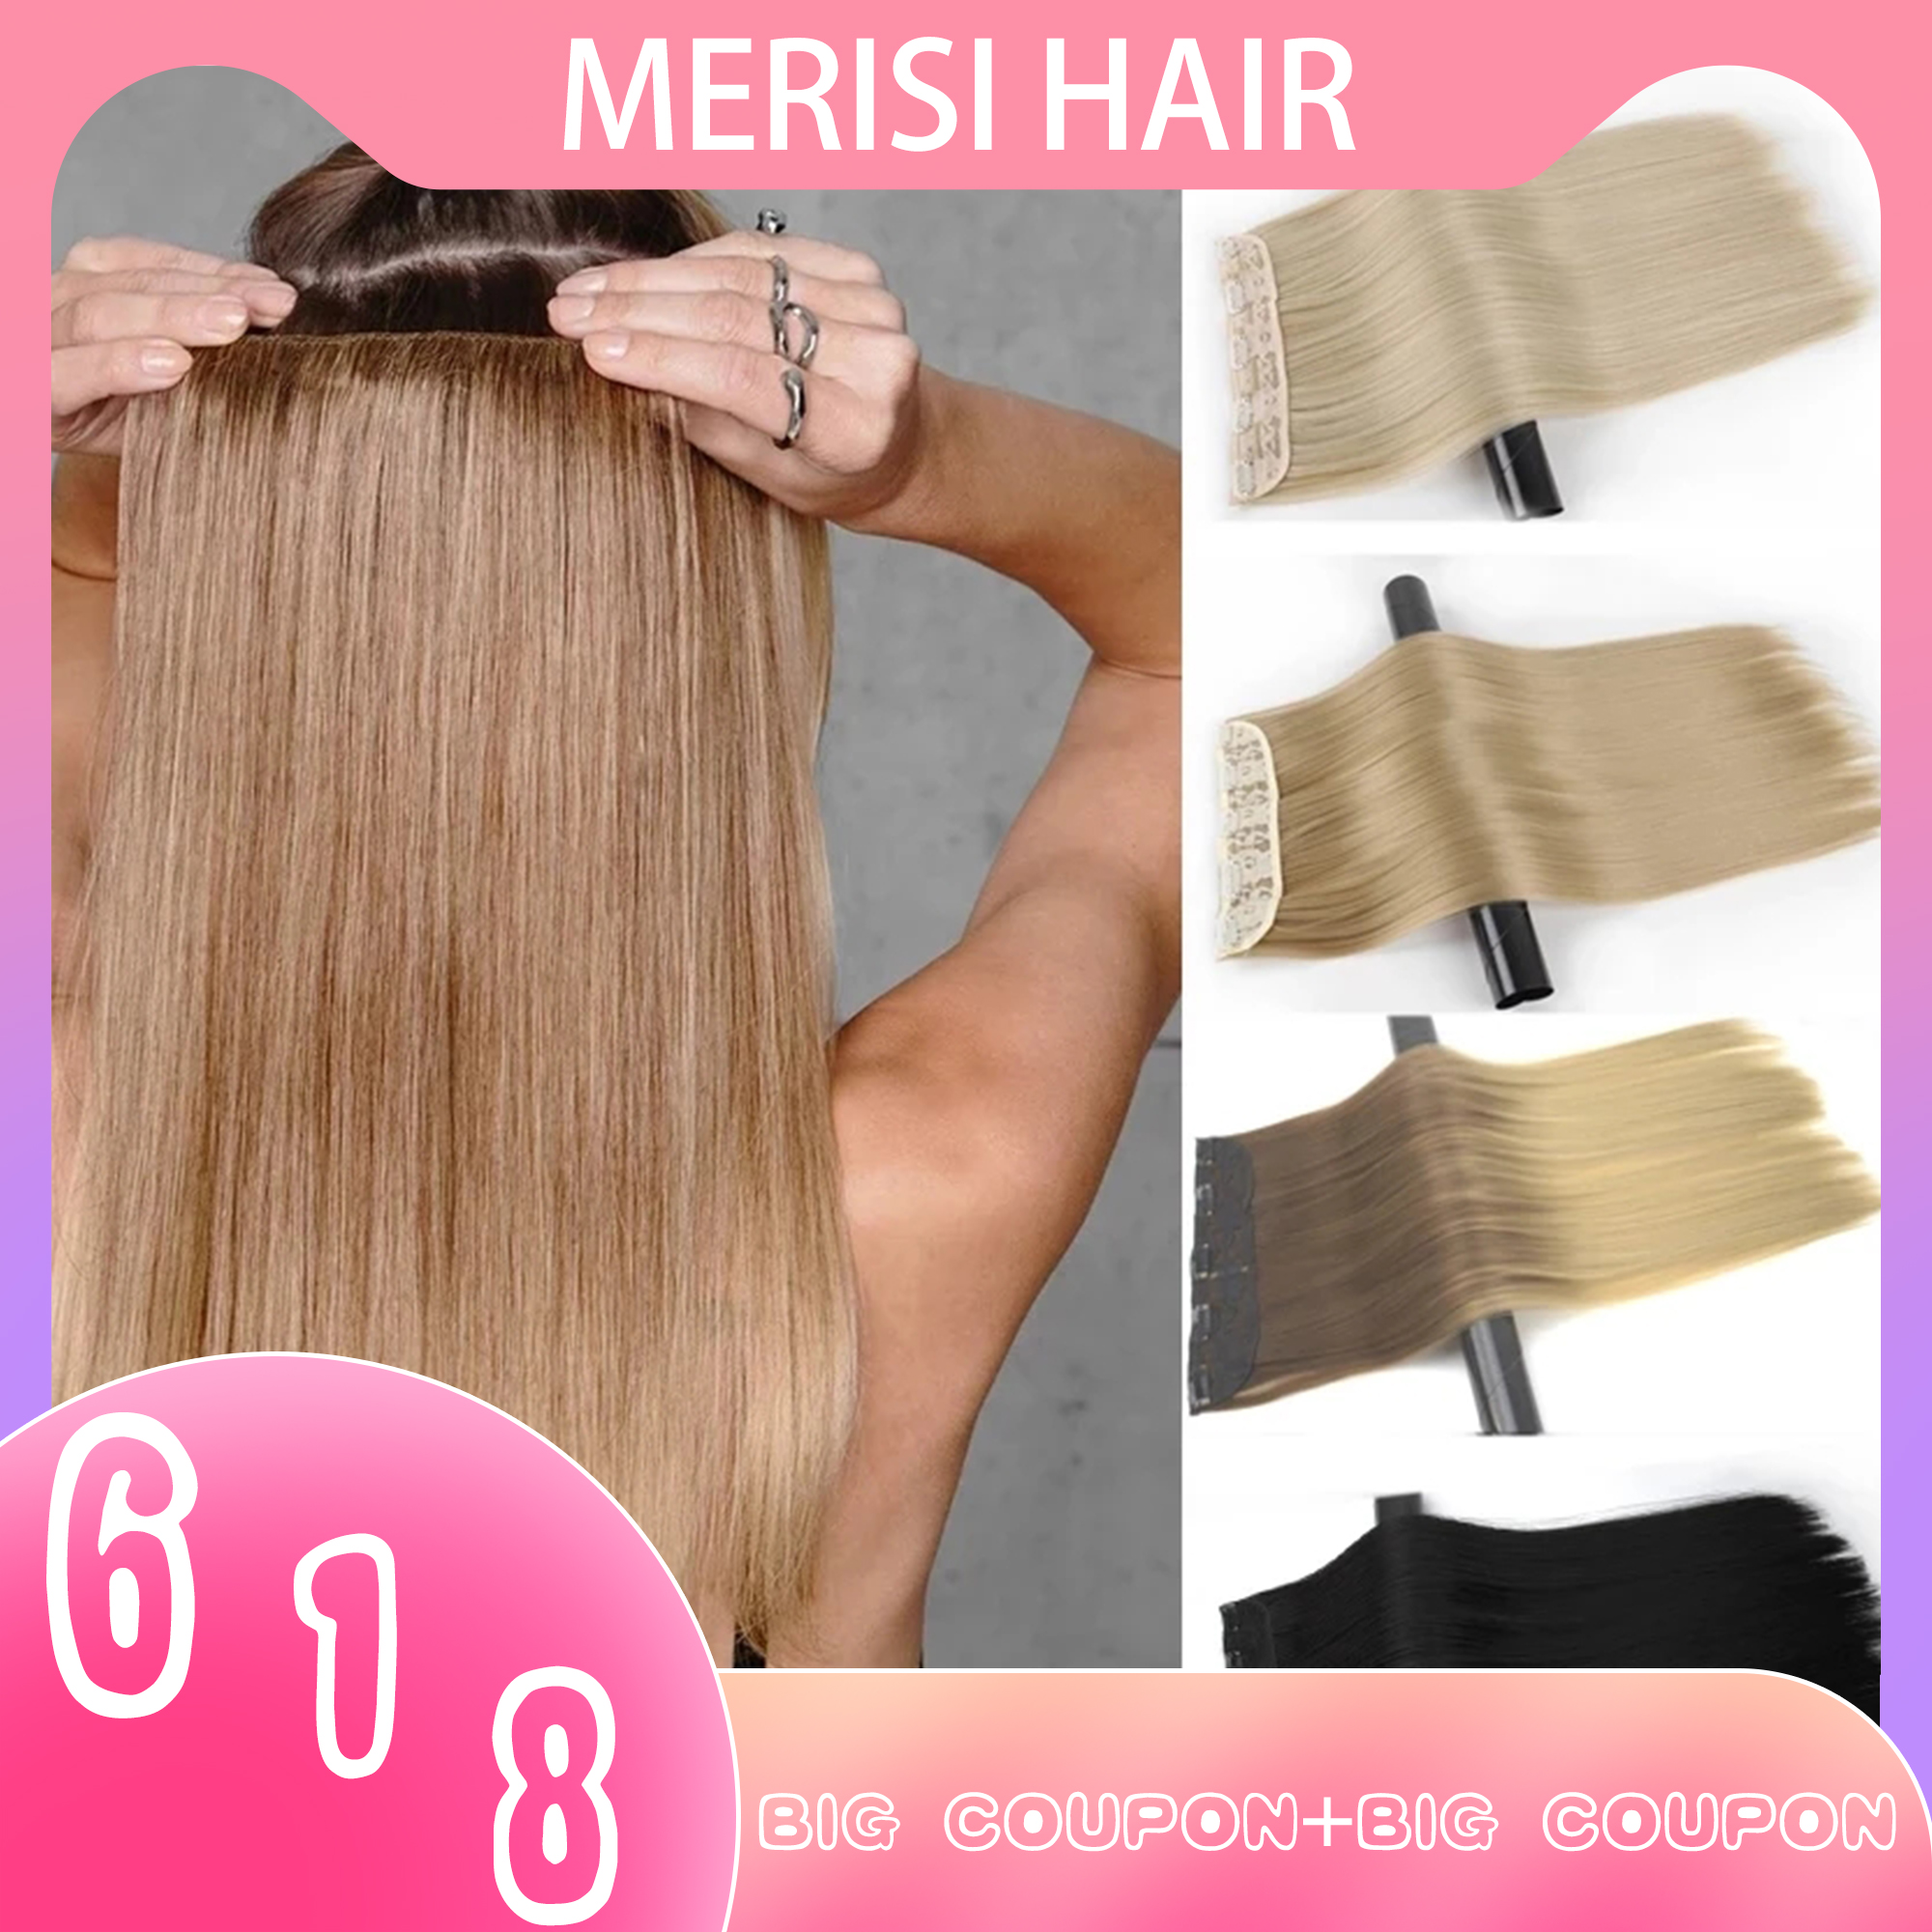 MERISI HAIR 5 Clips Synthetic Hair Long Straight Clip In Hair Extensions False Hair Black Hair Pieces for Women